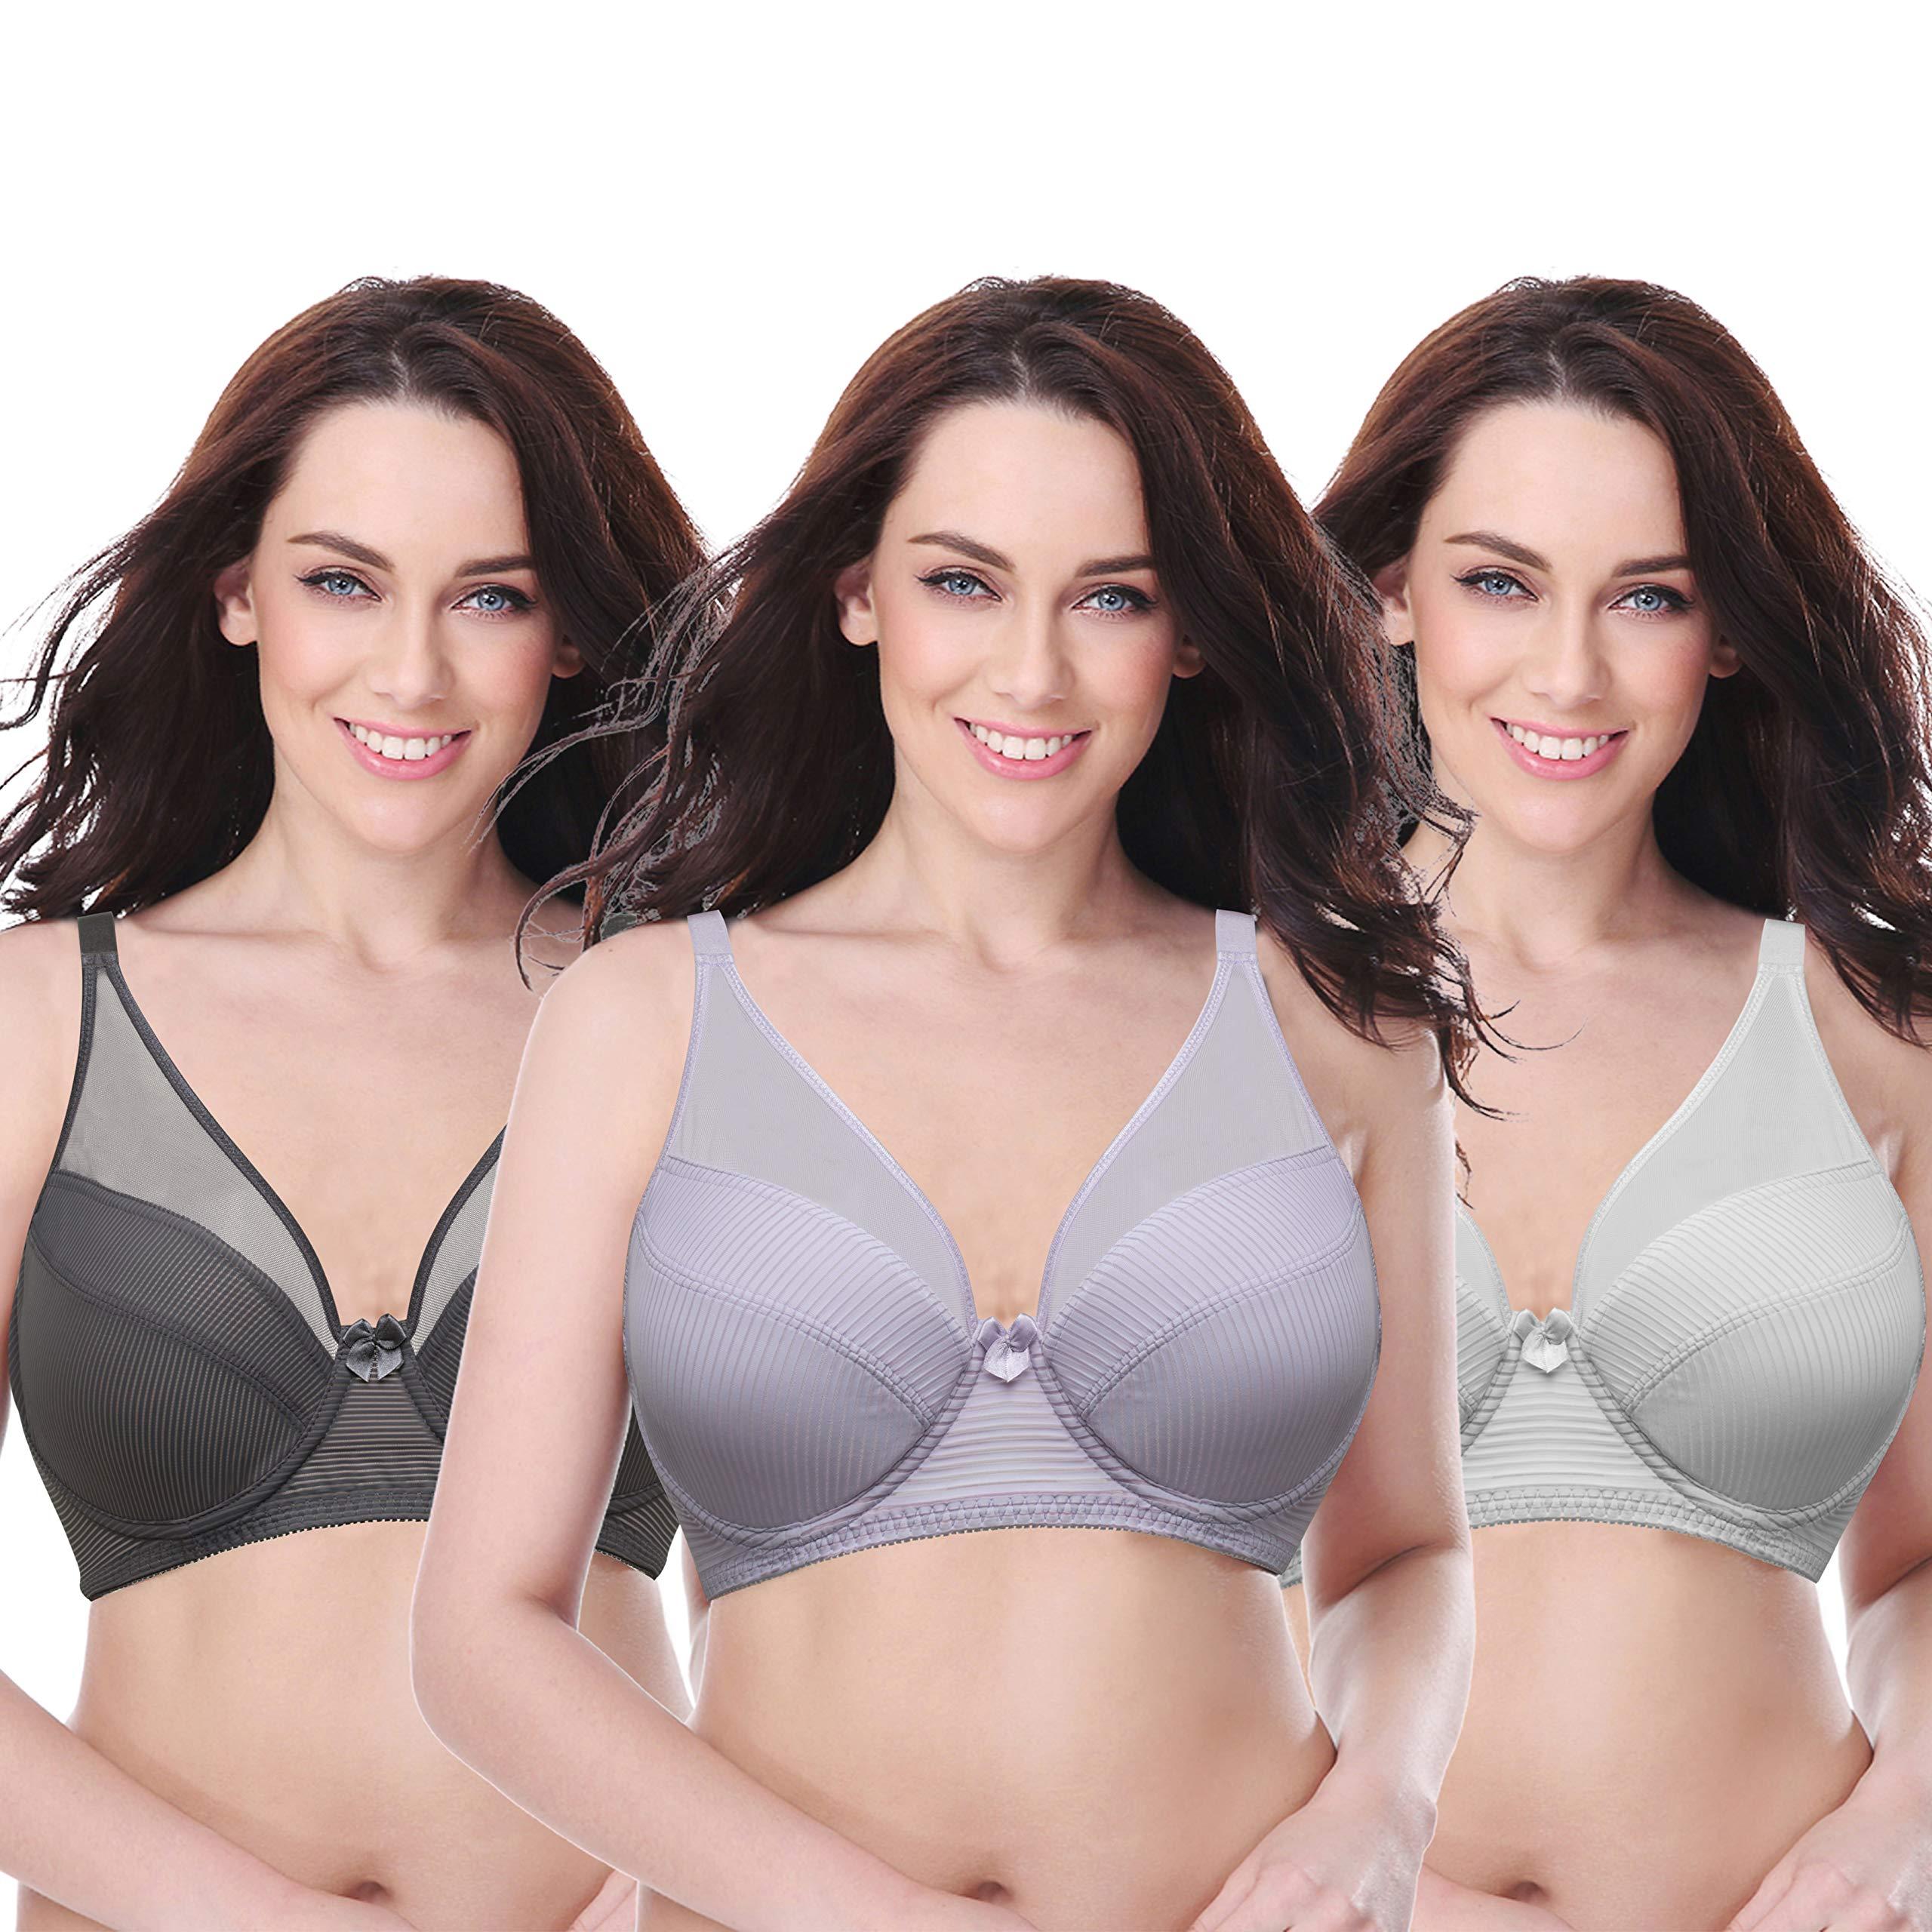 085e36d2494 Curve Muse Women s Plus Size Minimizer Unlined Underwire Full Coverage Bra -3PK-LAVENDER